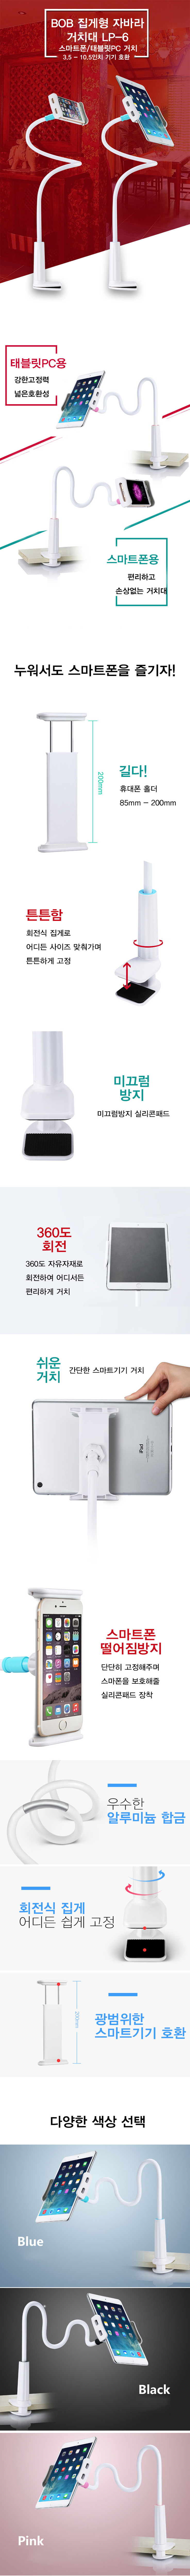 bob 자바라 거치대 LP-6 스마트폰 태블릿PC 홀더 집게조임형 - 비오비, 7,500원, 거치대/홀더, 일반 거치대